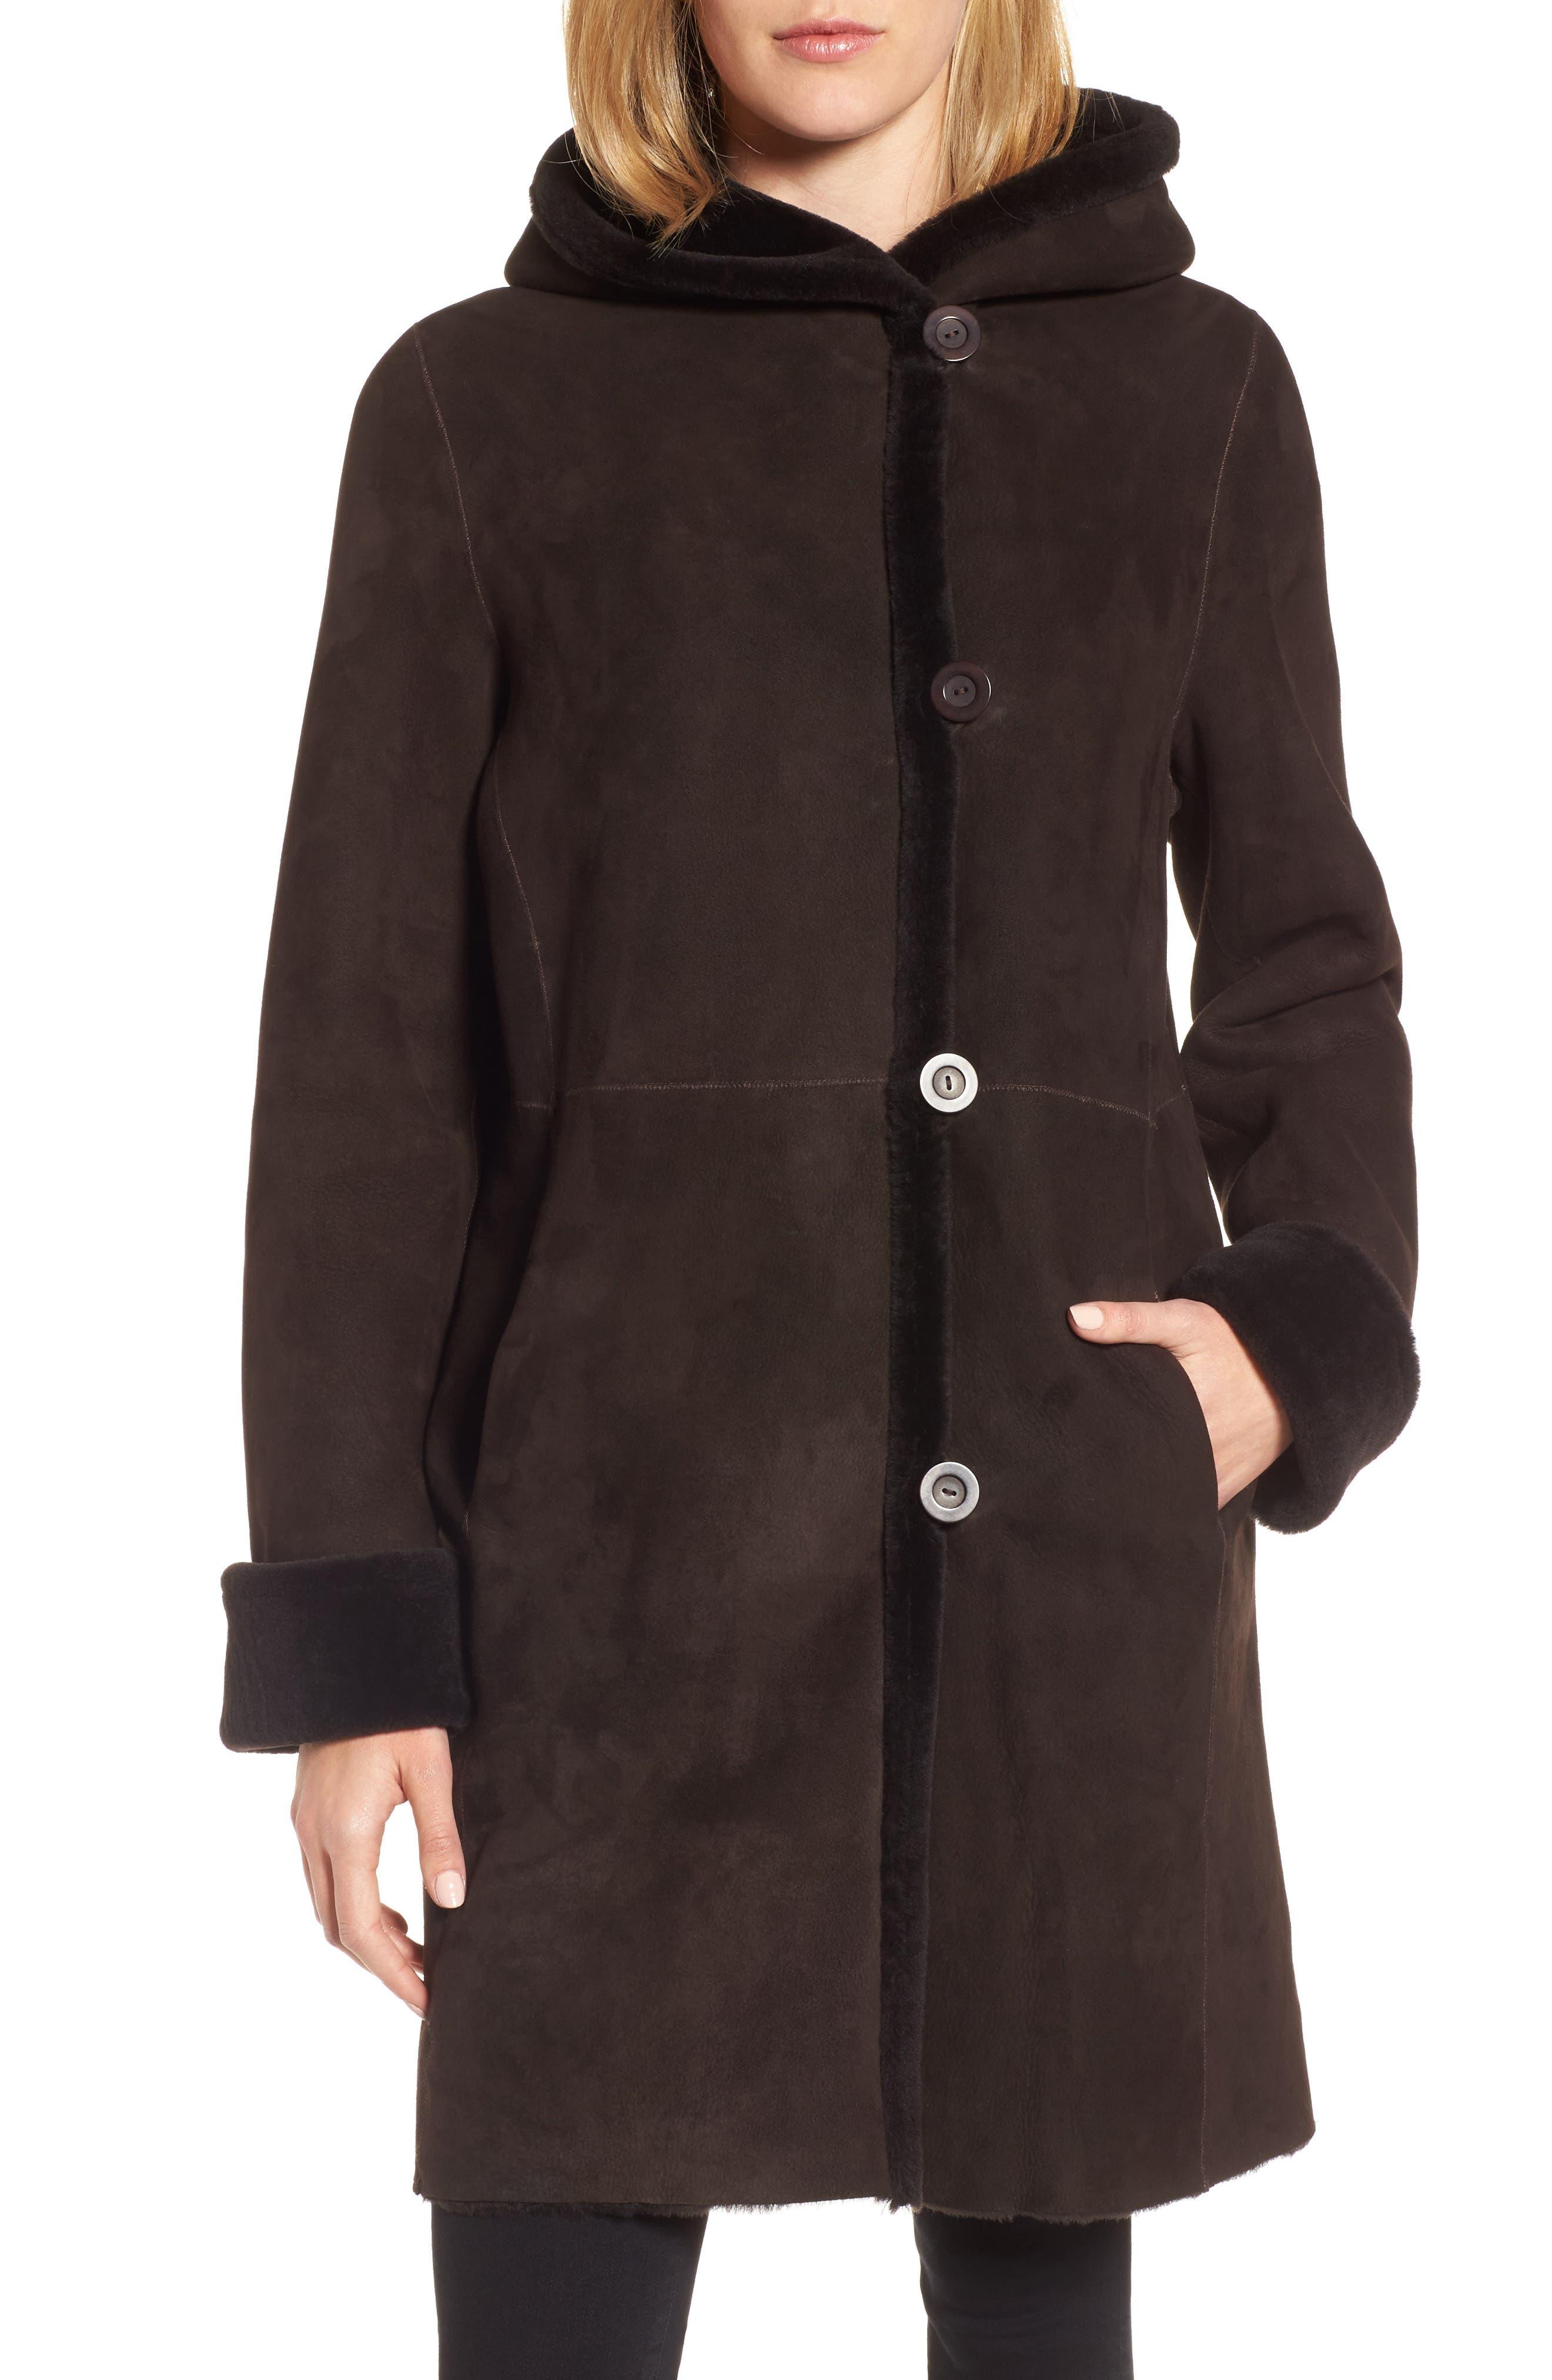 Hooded Genuine Shearling Coat,                         Main,                         color, 206